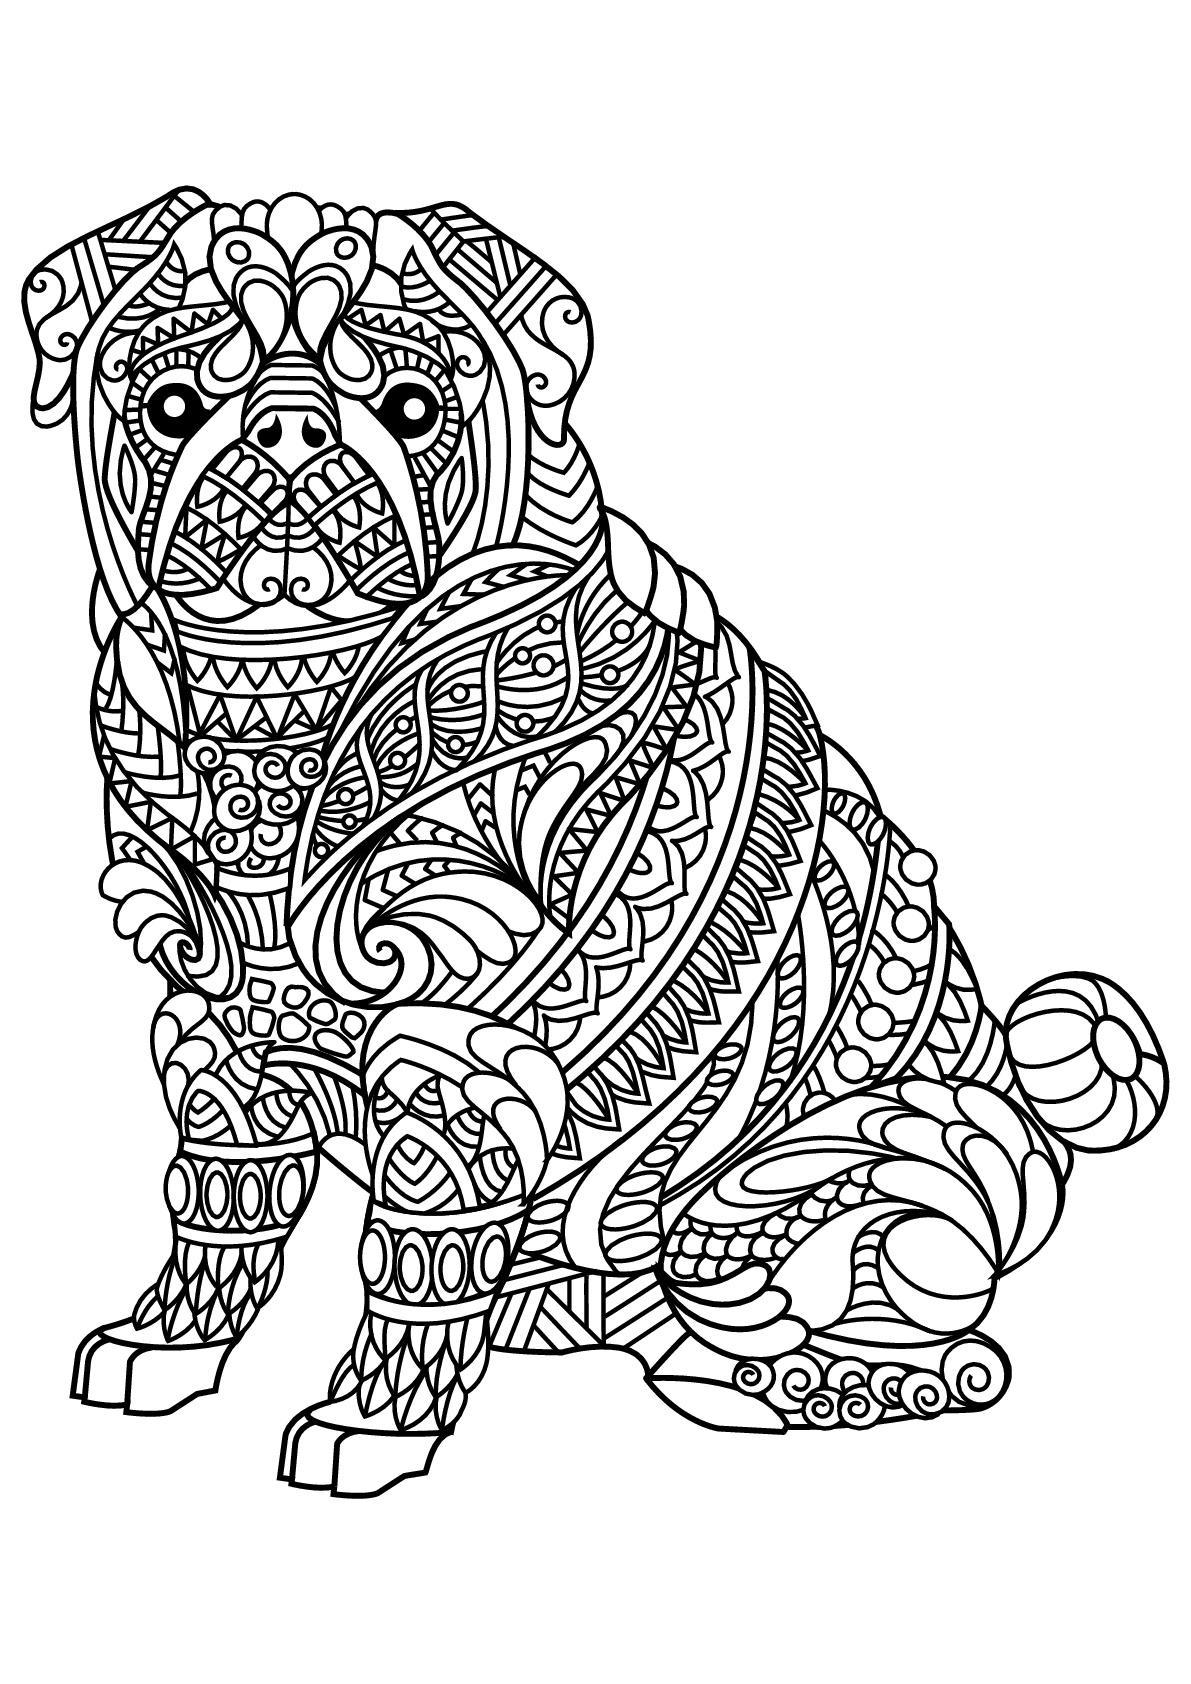 раскраски антистресс собака бульдог